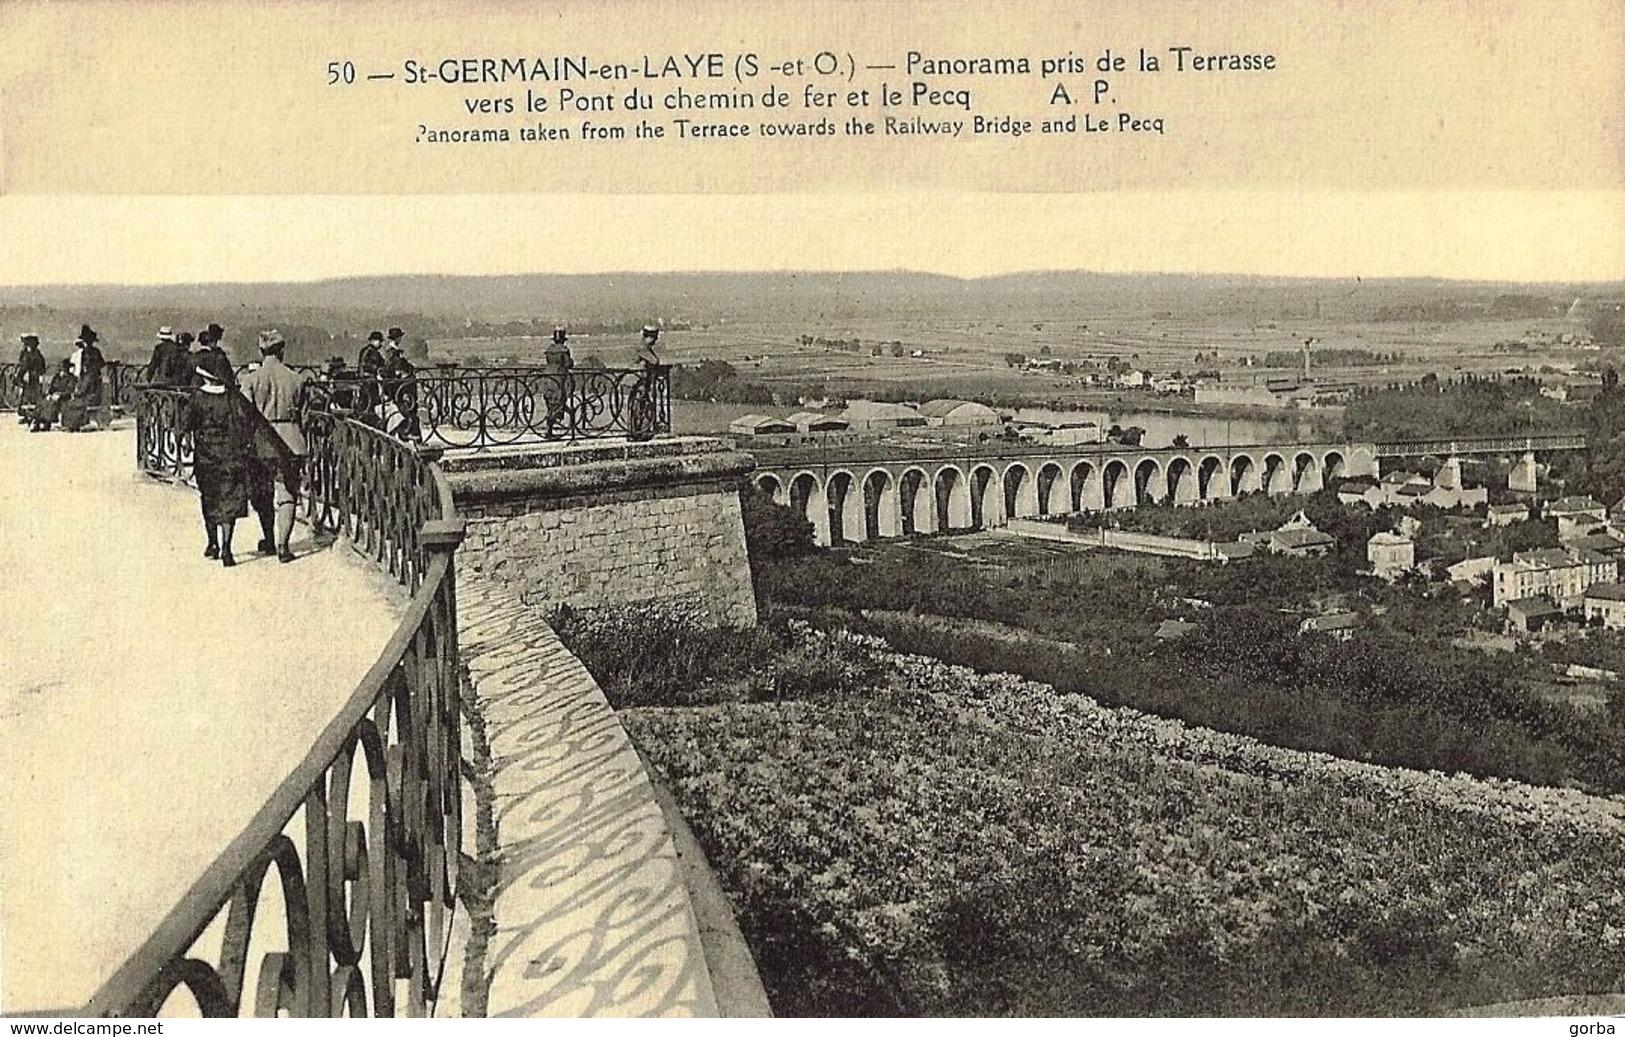 *CPA - 78 - SAINT GERMAIN En LAYE - Panorama Pris De La Terrasse - Pont De Chemin De Fer - Animée - St. Germain En Laye